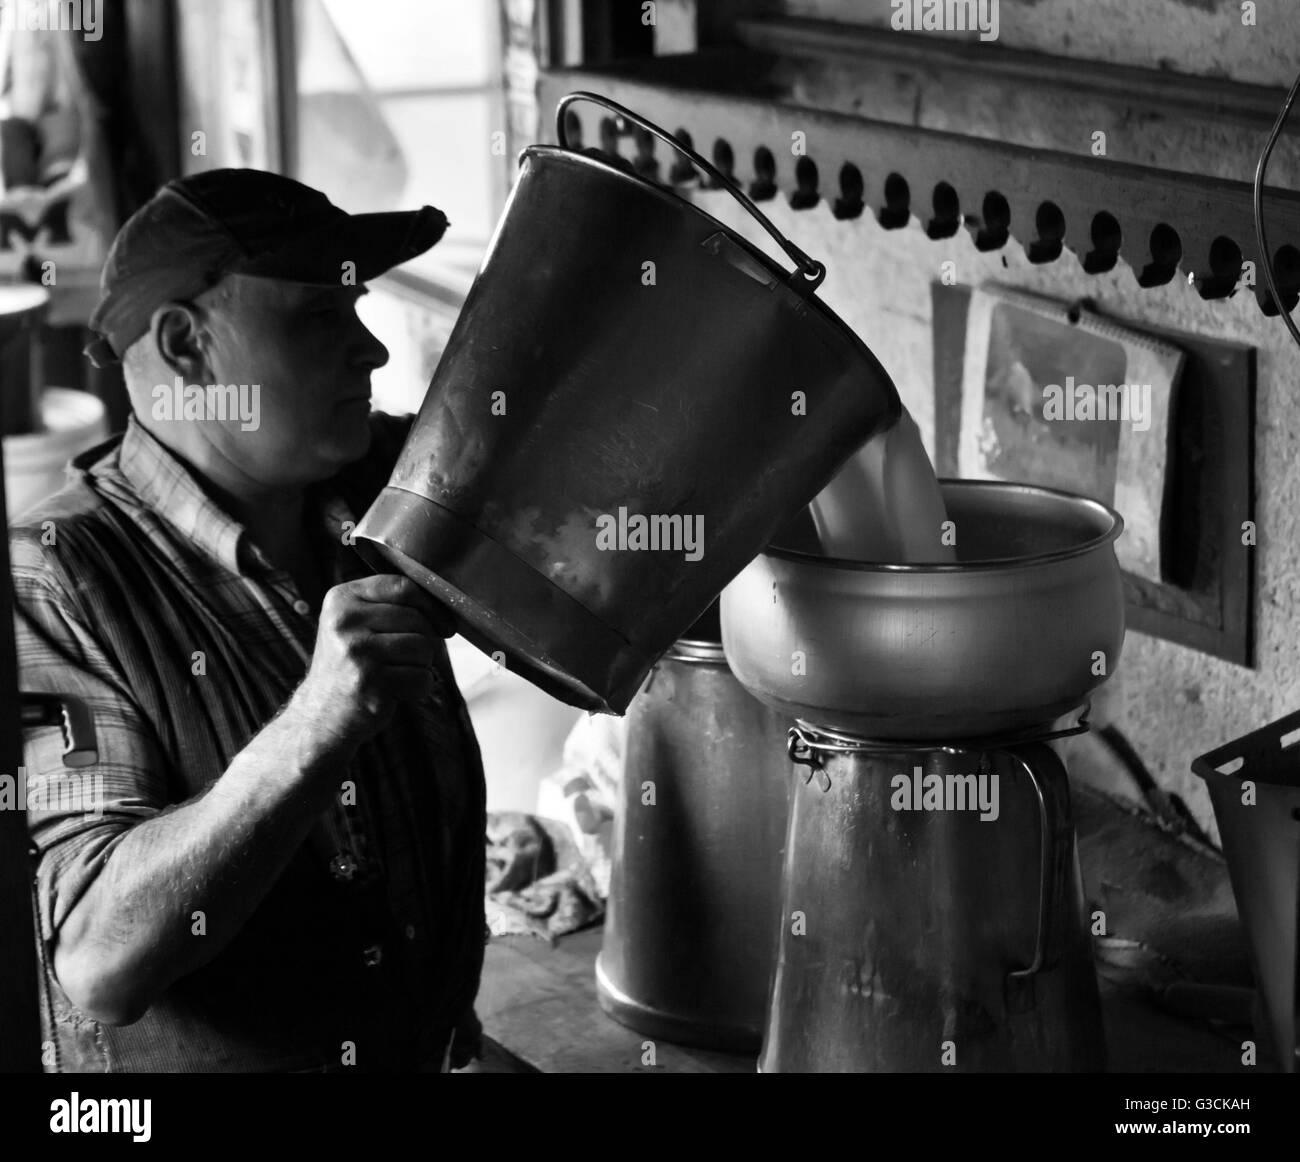 Milk production - Stock Image